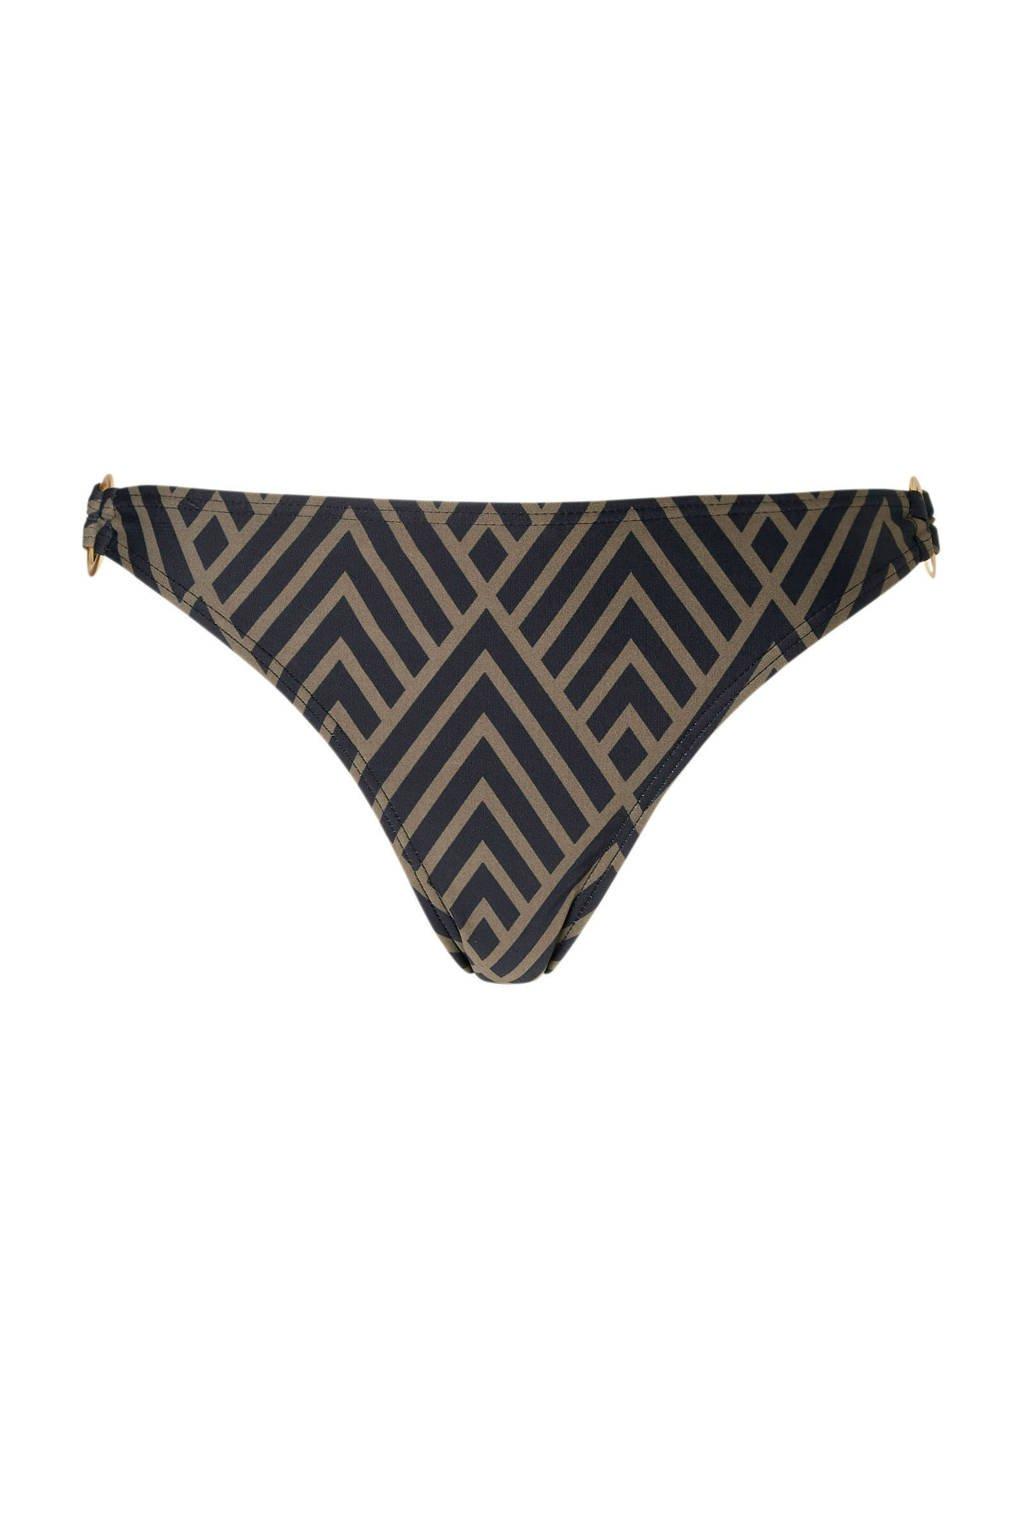 whkmp's beachwave bikinibroekje in all over print zwart, Zwart/taupe